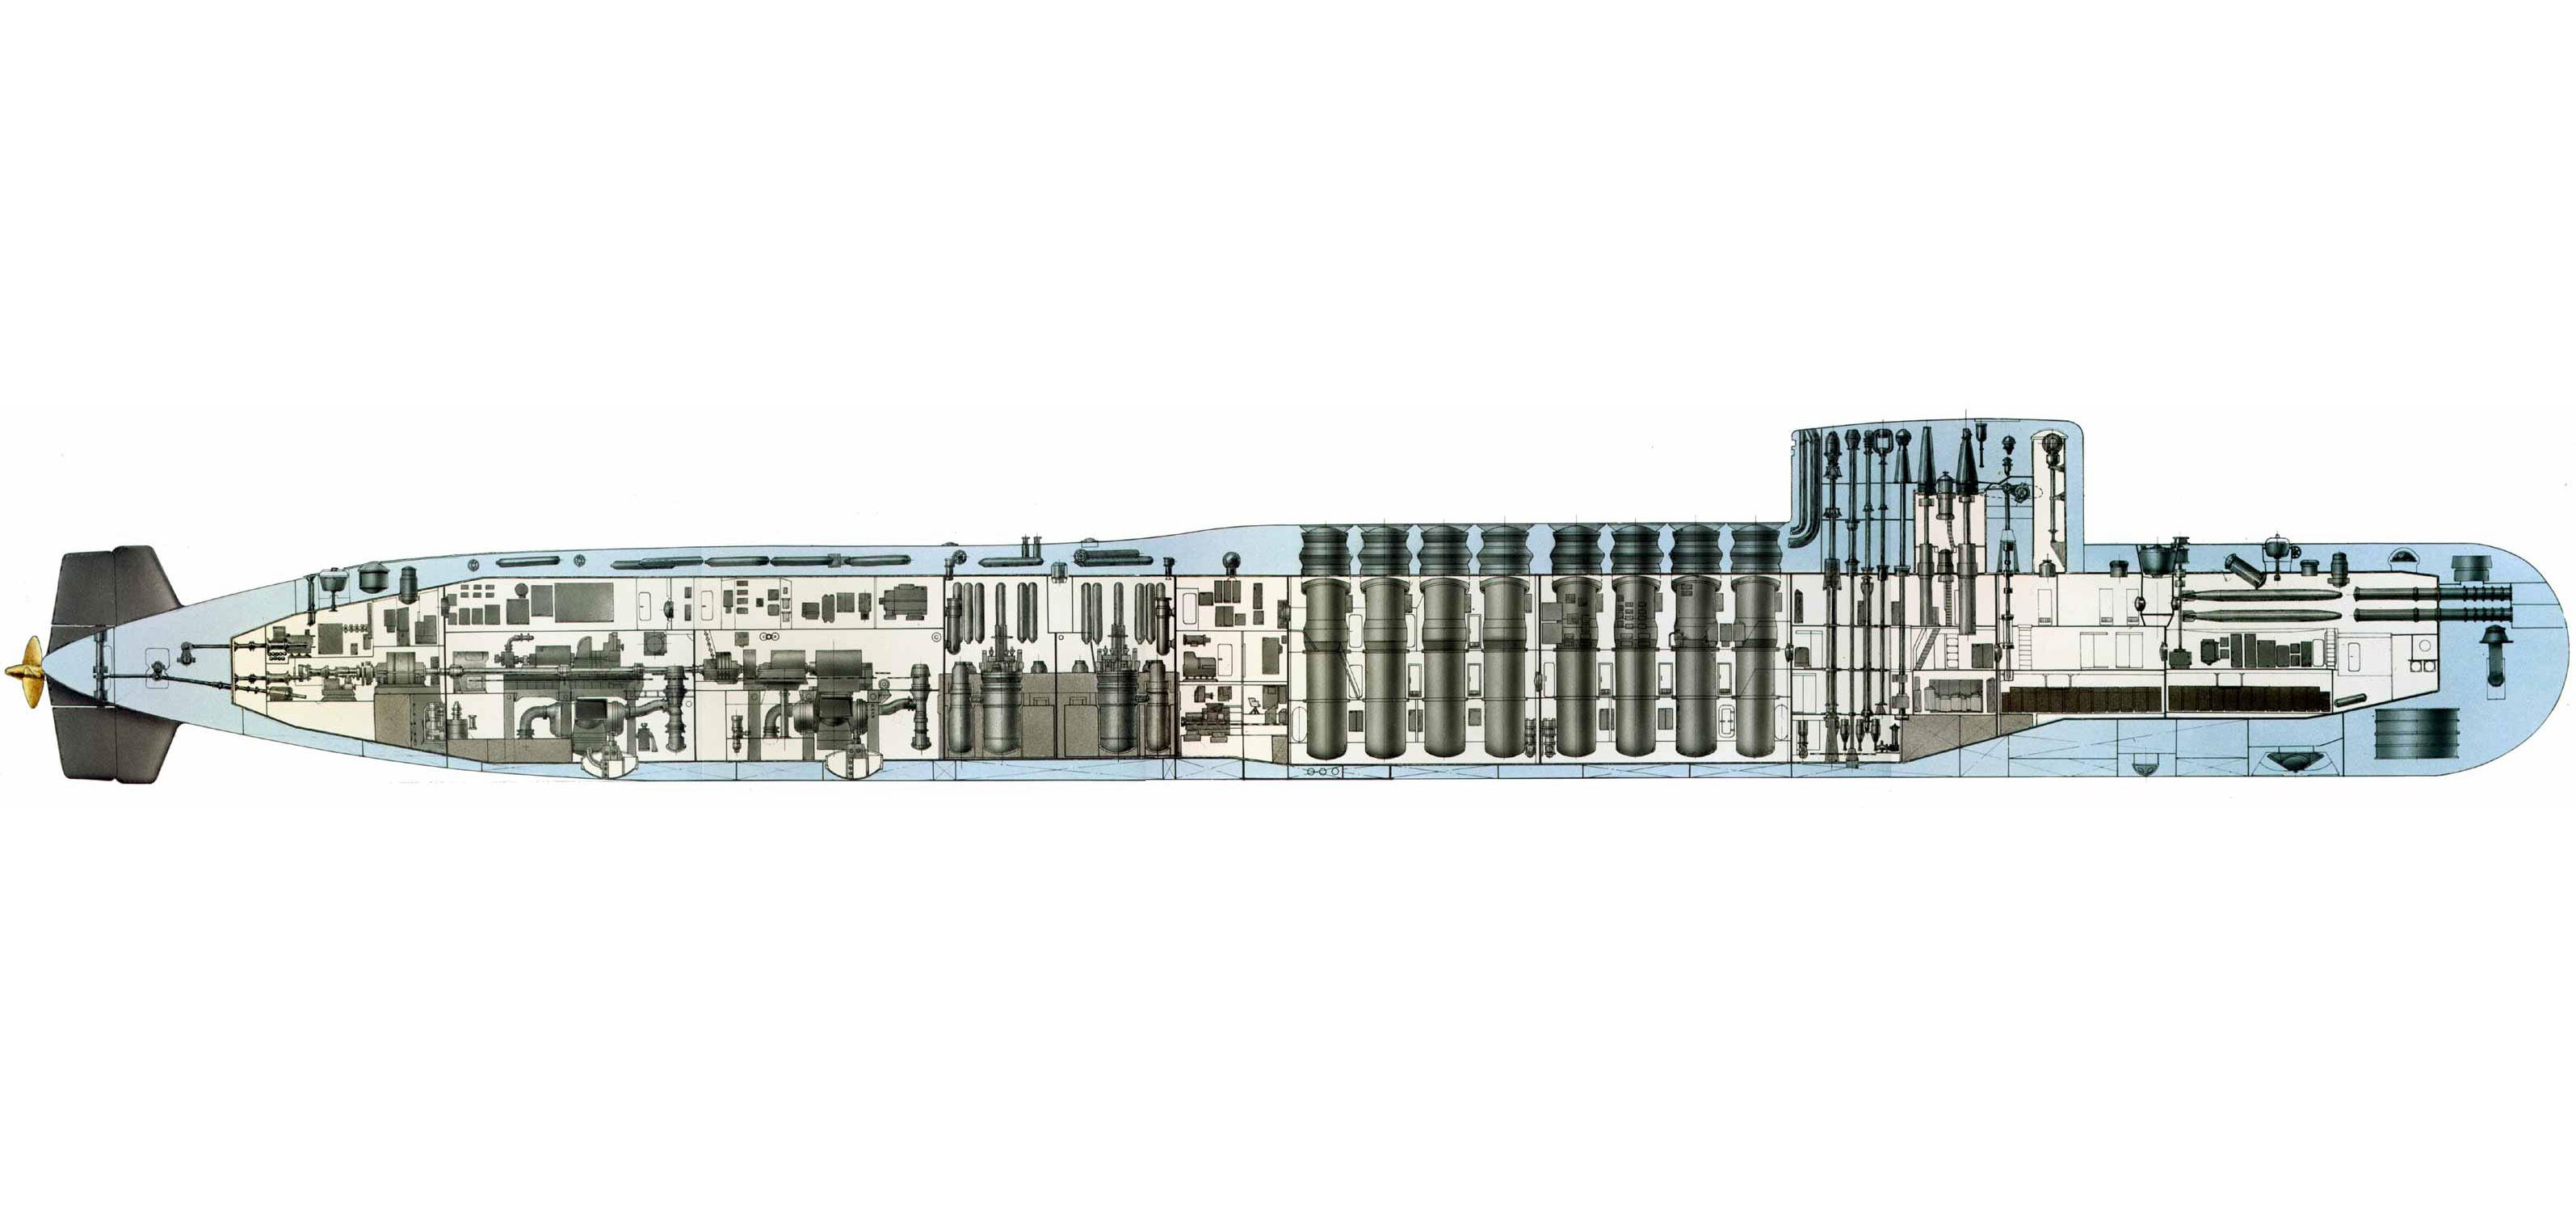 Yankee-class submarine cutaway drawing